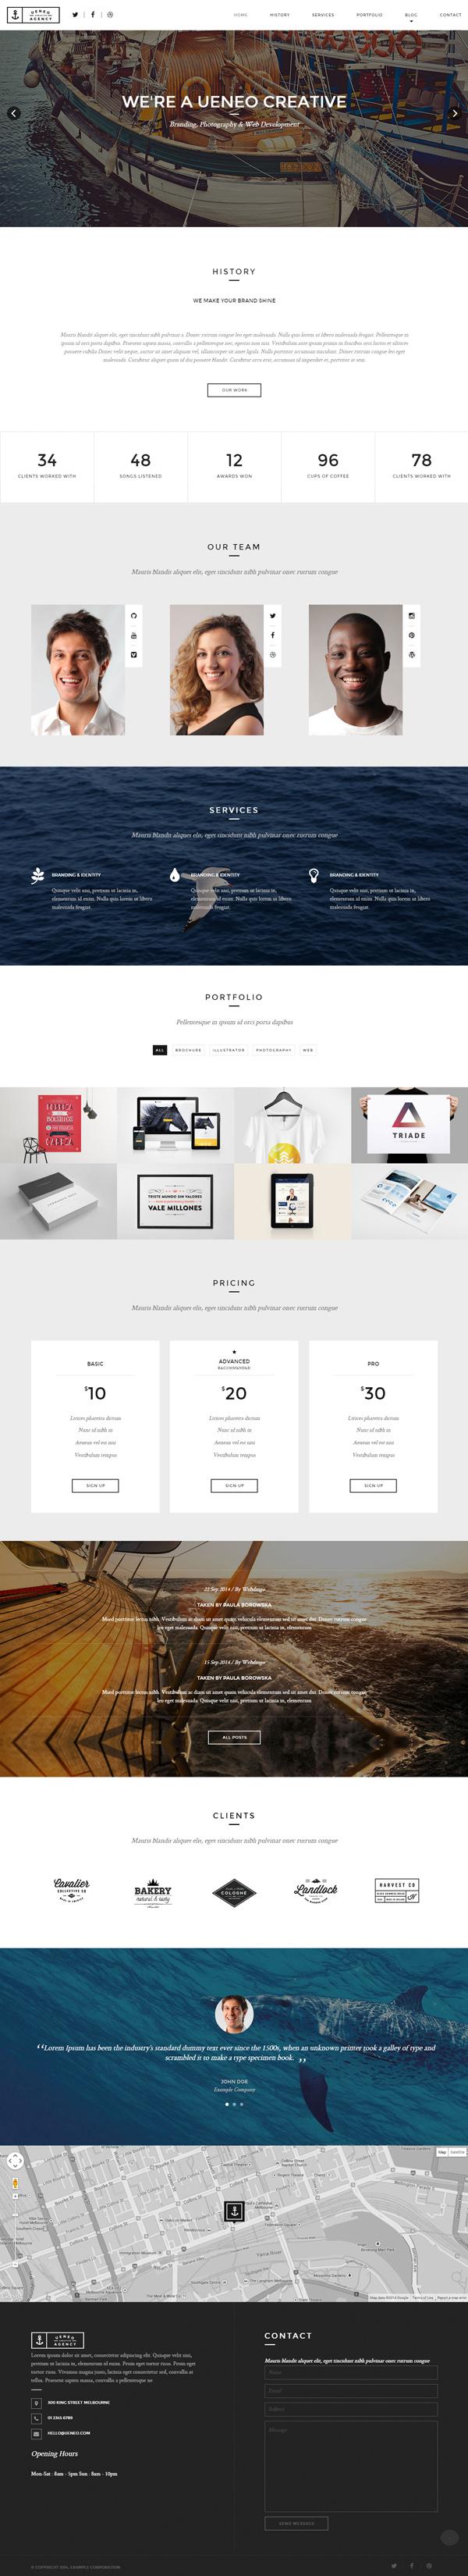 Ueneo - Creative One Page Parallax WordPress Theme